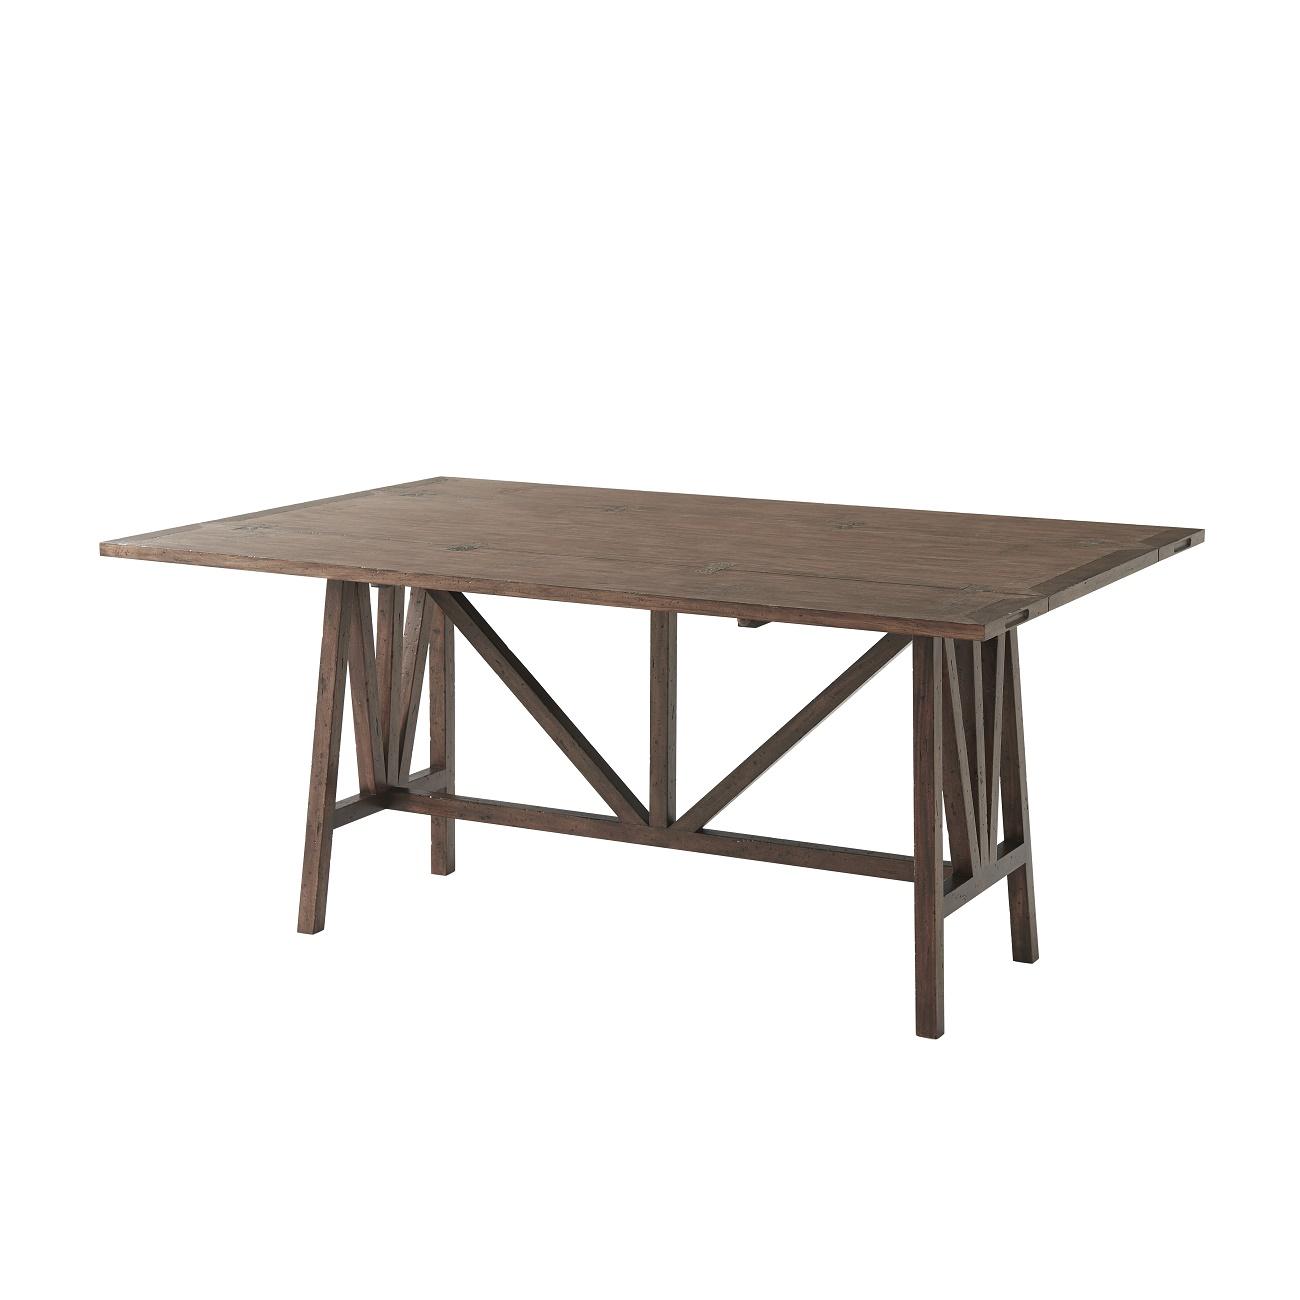 Dakota Consoledining Table, Theodore Alexander Table Brooklyn, New York